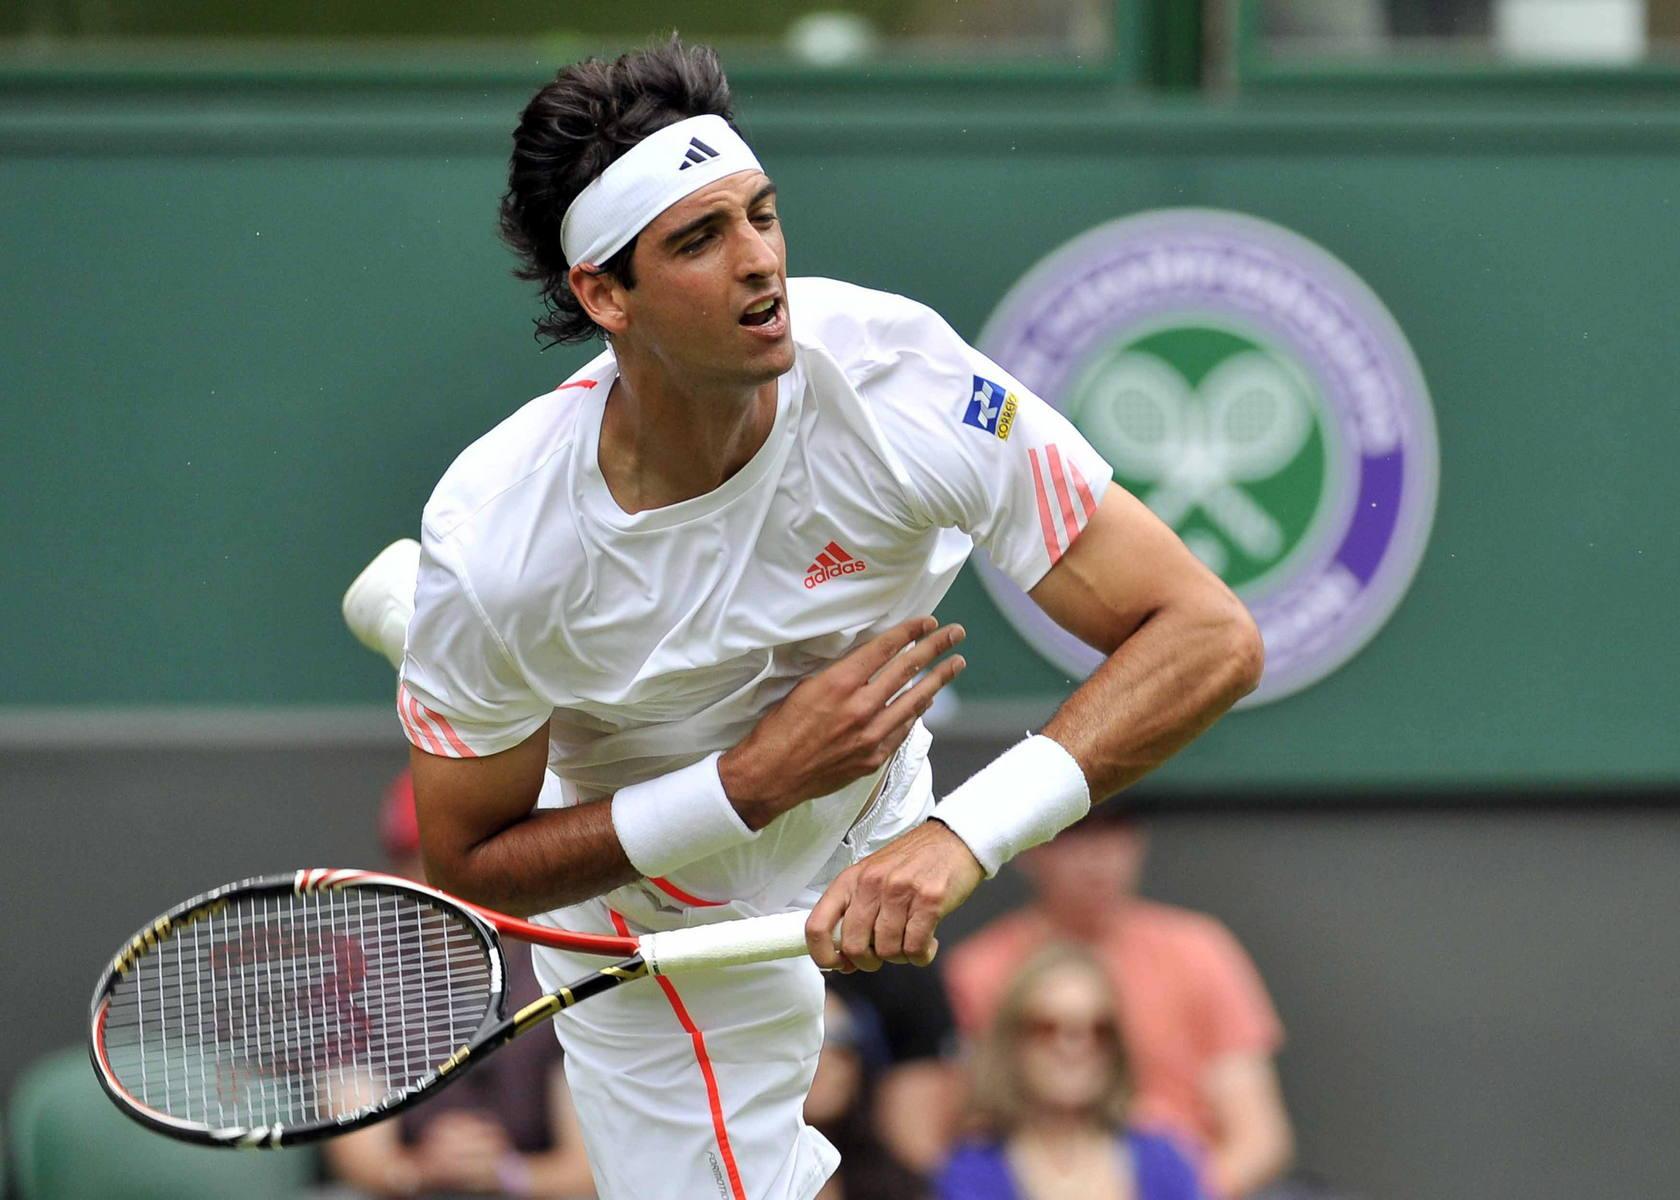 Nadal supera a Bellucci y pasa a segunda ronda